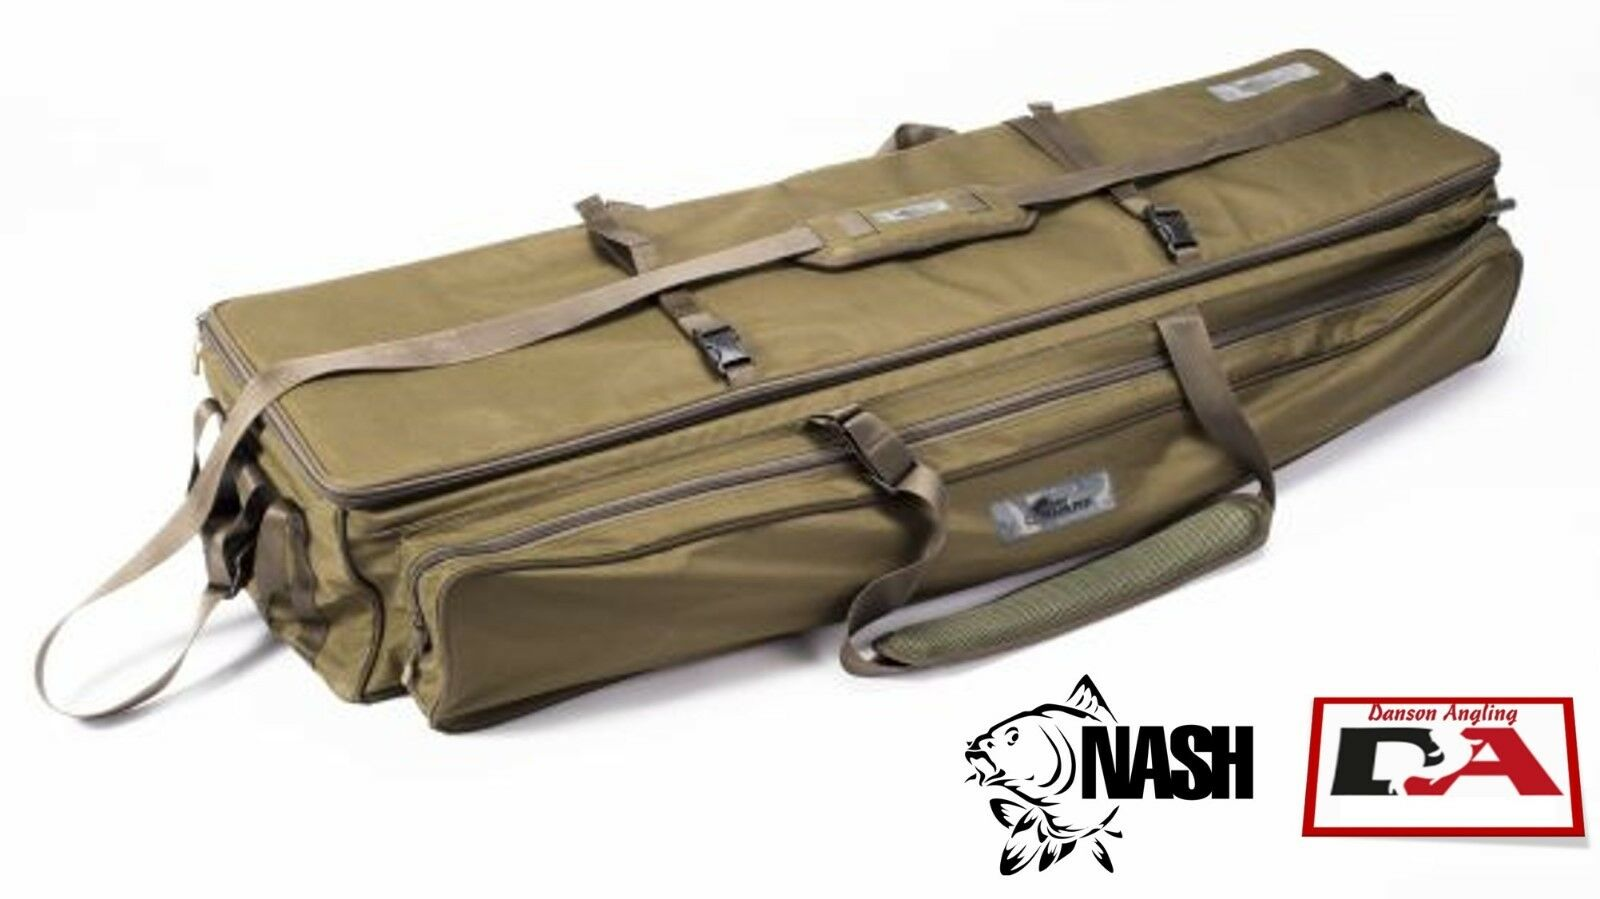 Nash Dwarf 9ft 3 Rod Carry System T4686 NEW 2019